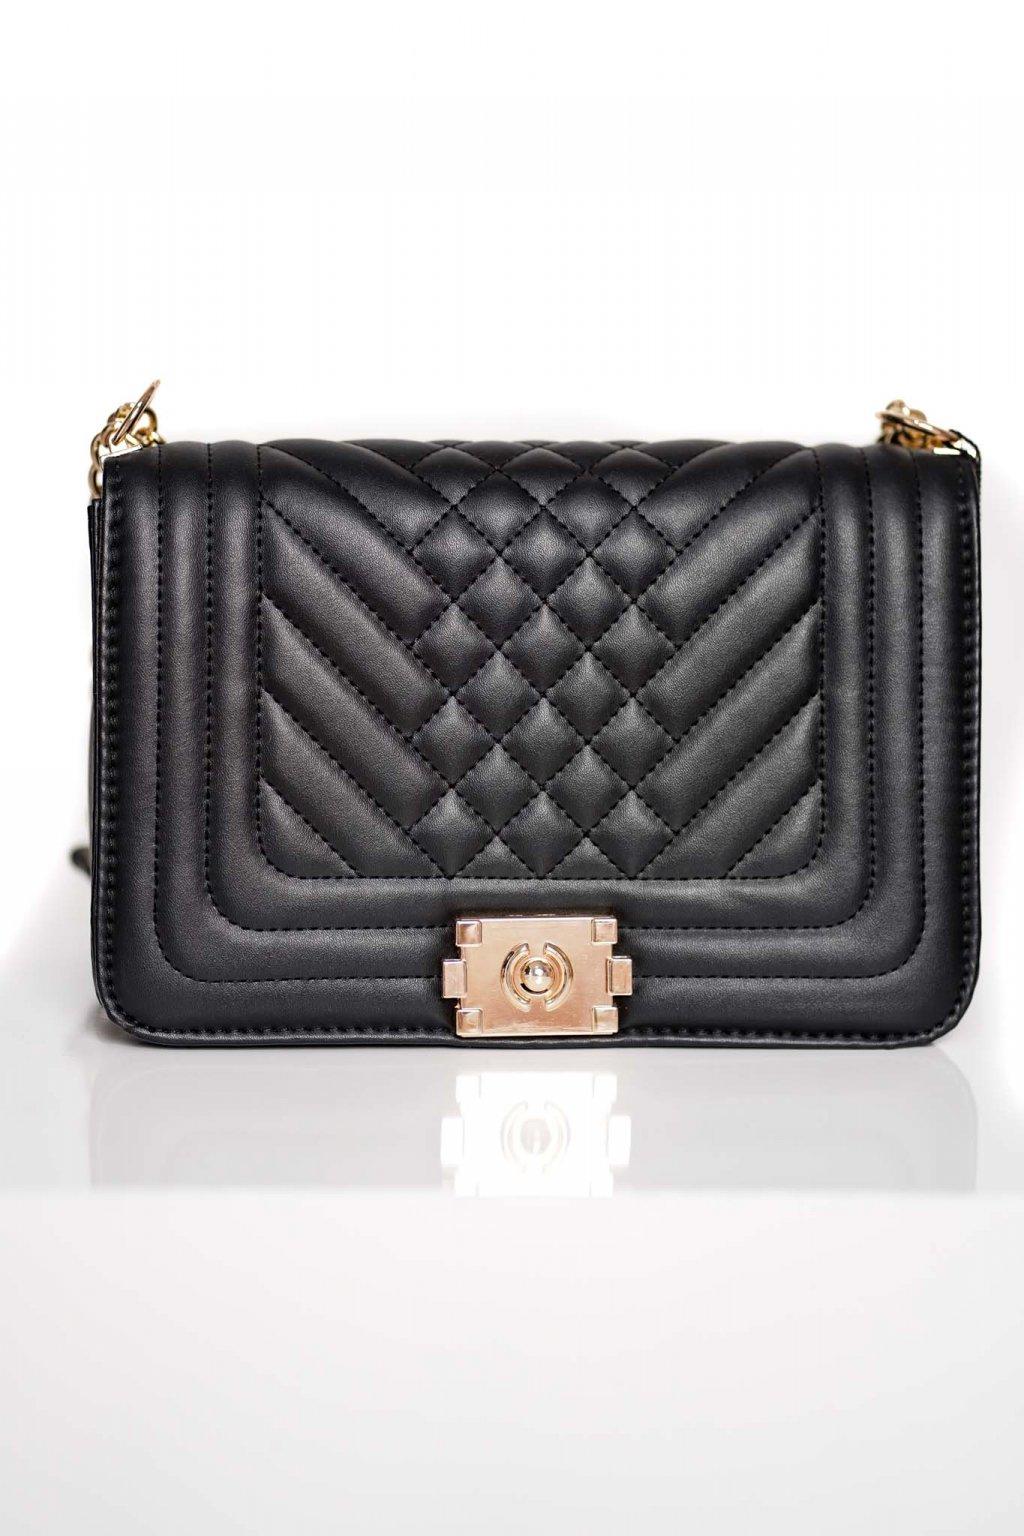 kabelka, crossbody kabelka, veľká kabelka, basic kabelka, čierna kabelka. sivá kabelka, tote, spoločenská kabelka 01